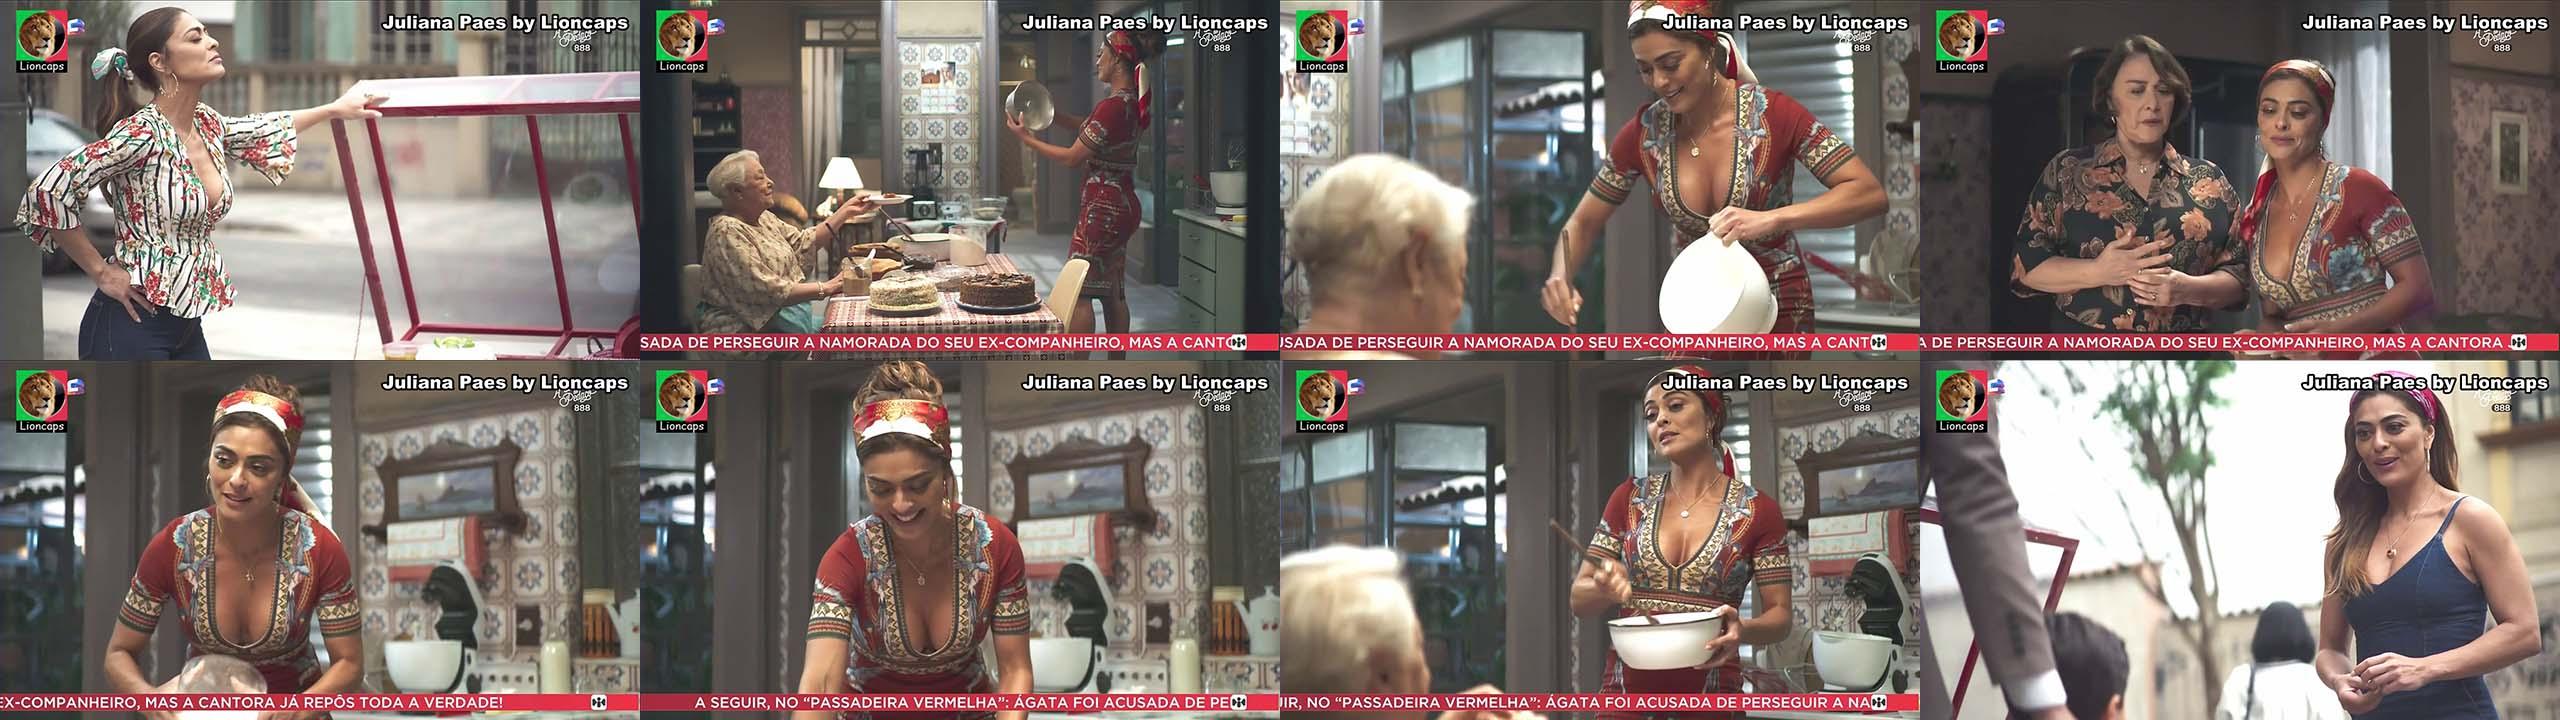 604420403_juliana_paes_dona_pedaco_lioncaps_26_12_2019_02_122_46lo.jpg